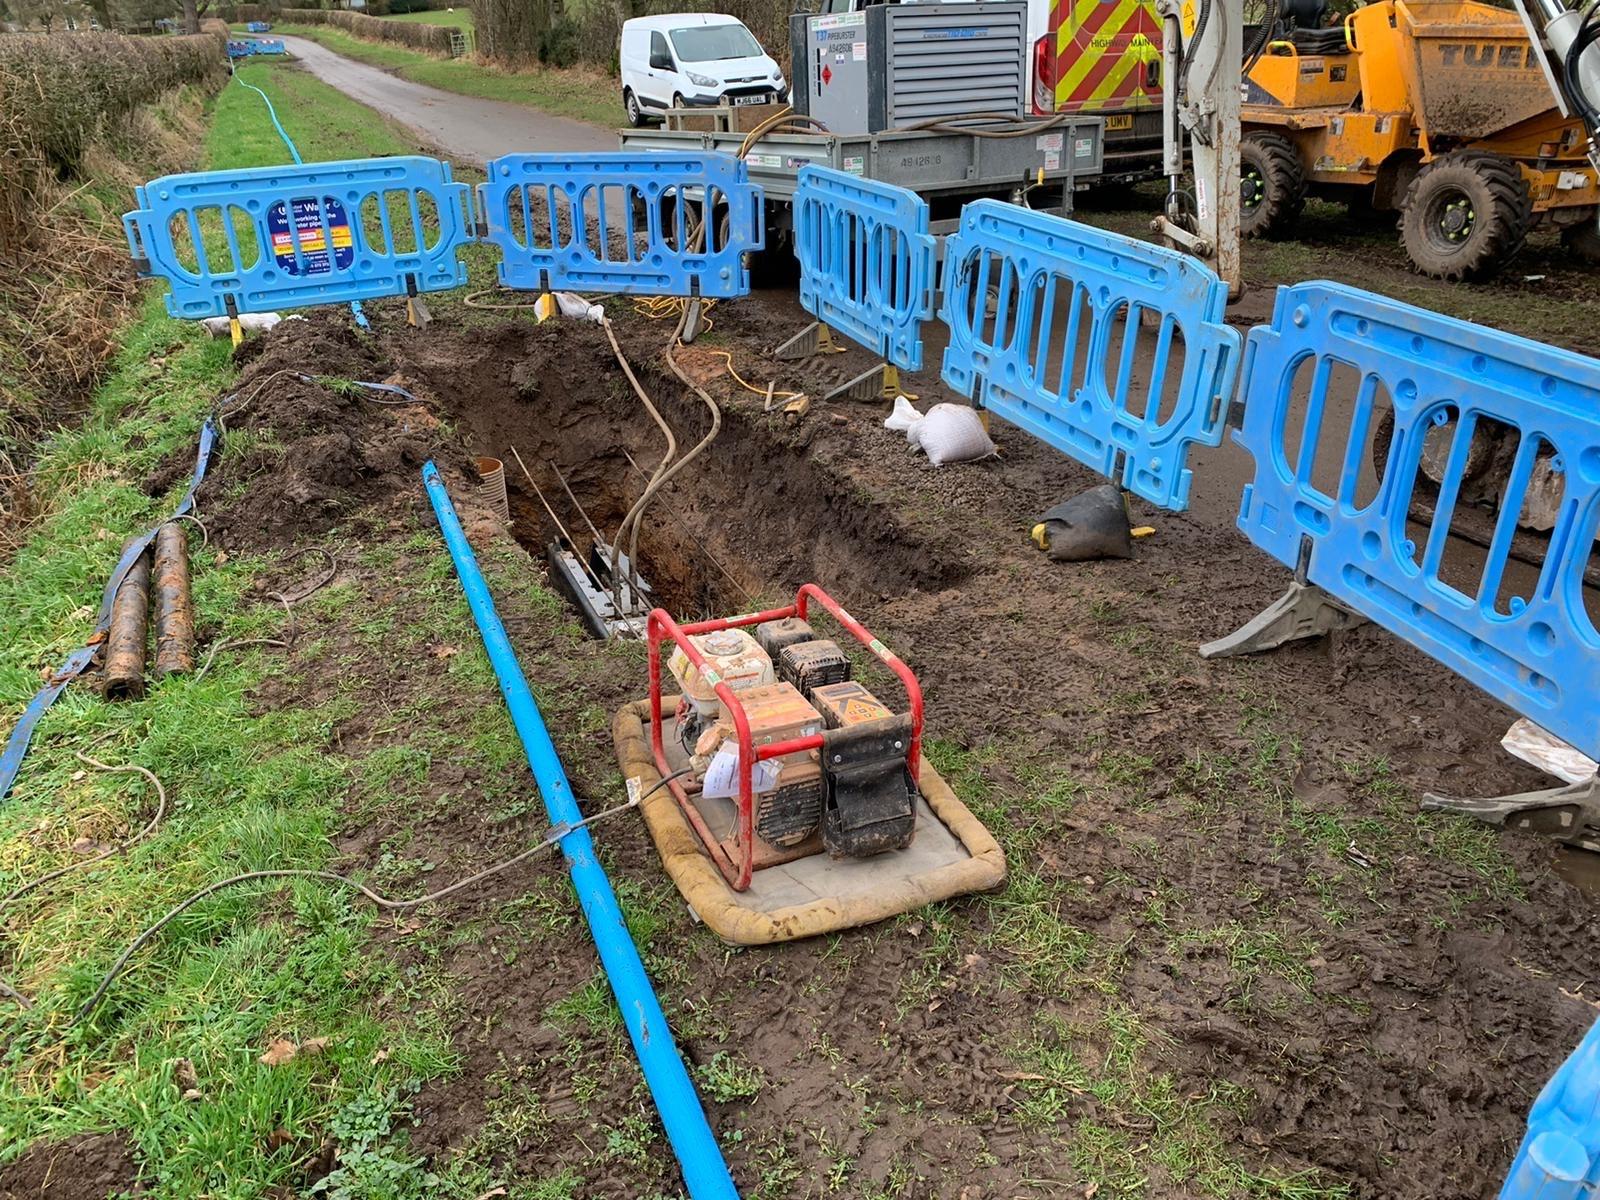 Commercial Water Repairs snd Maintenance Work